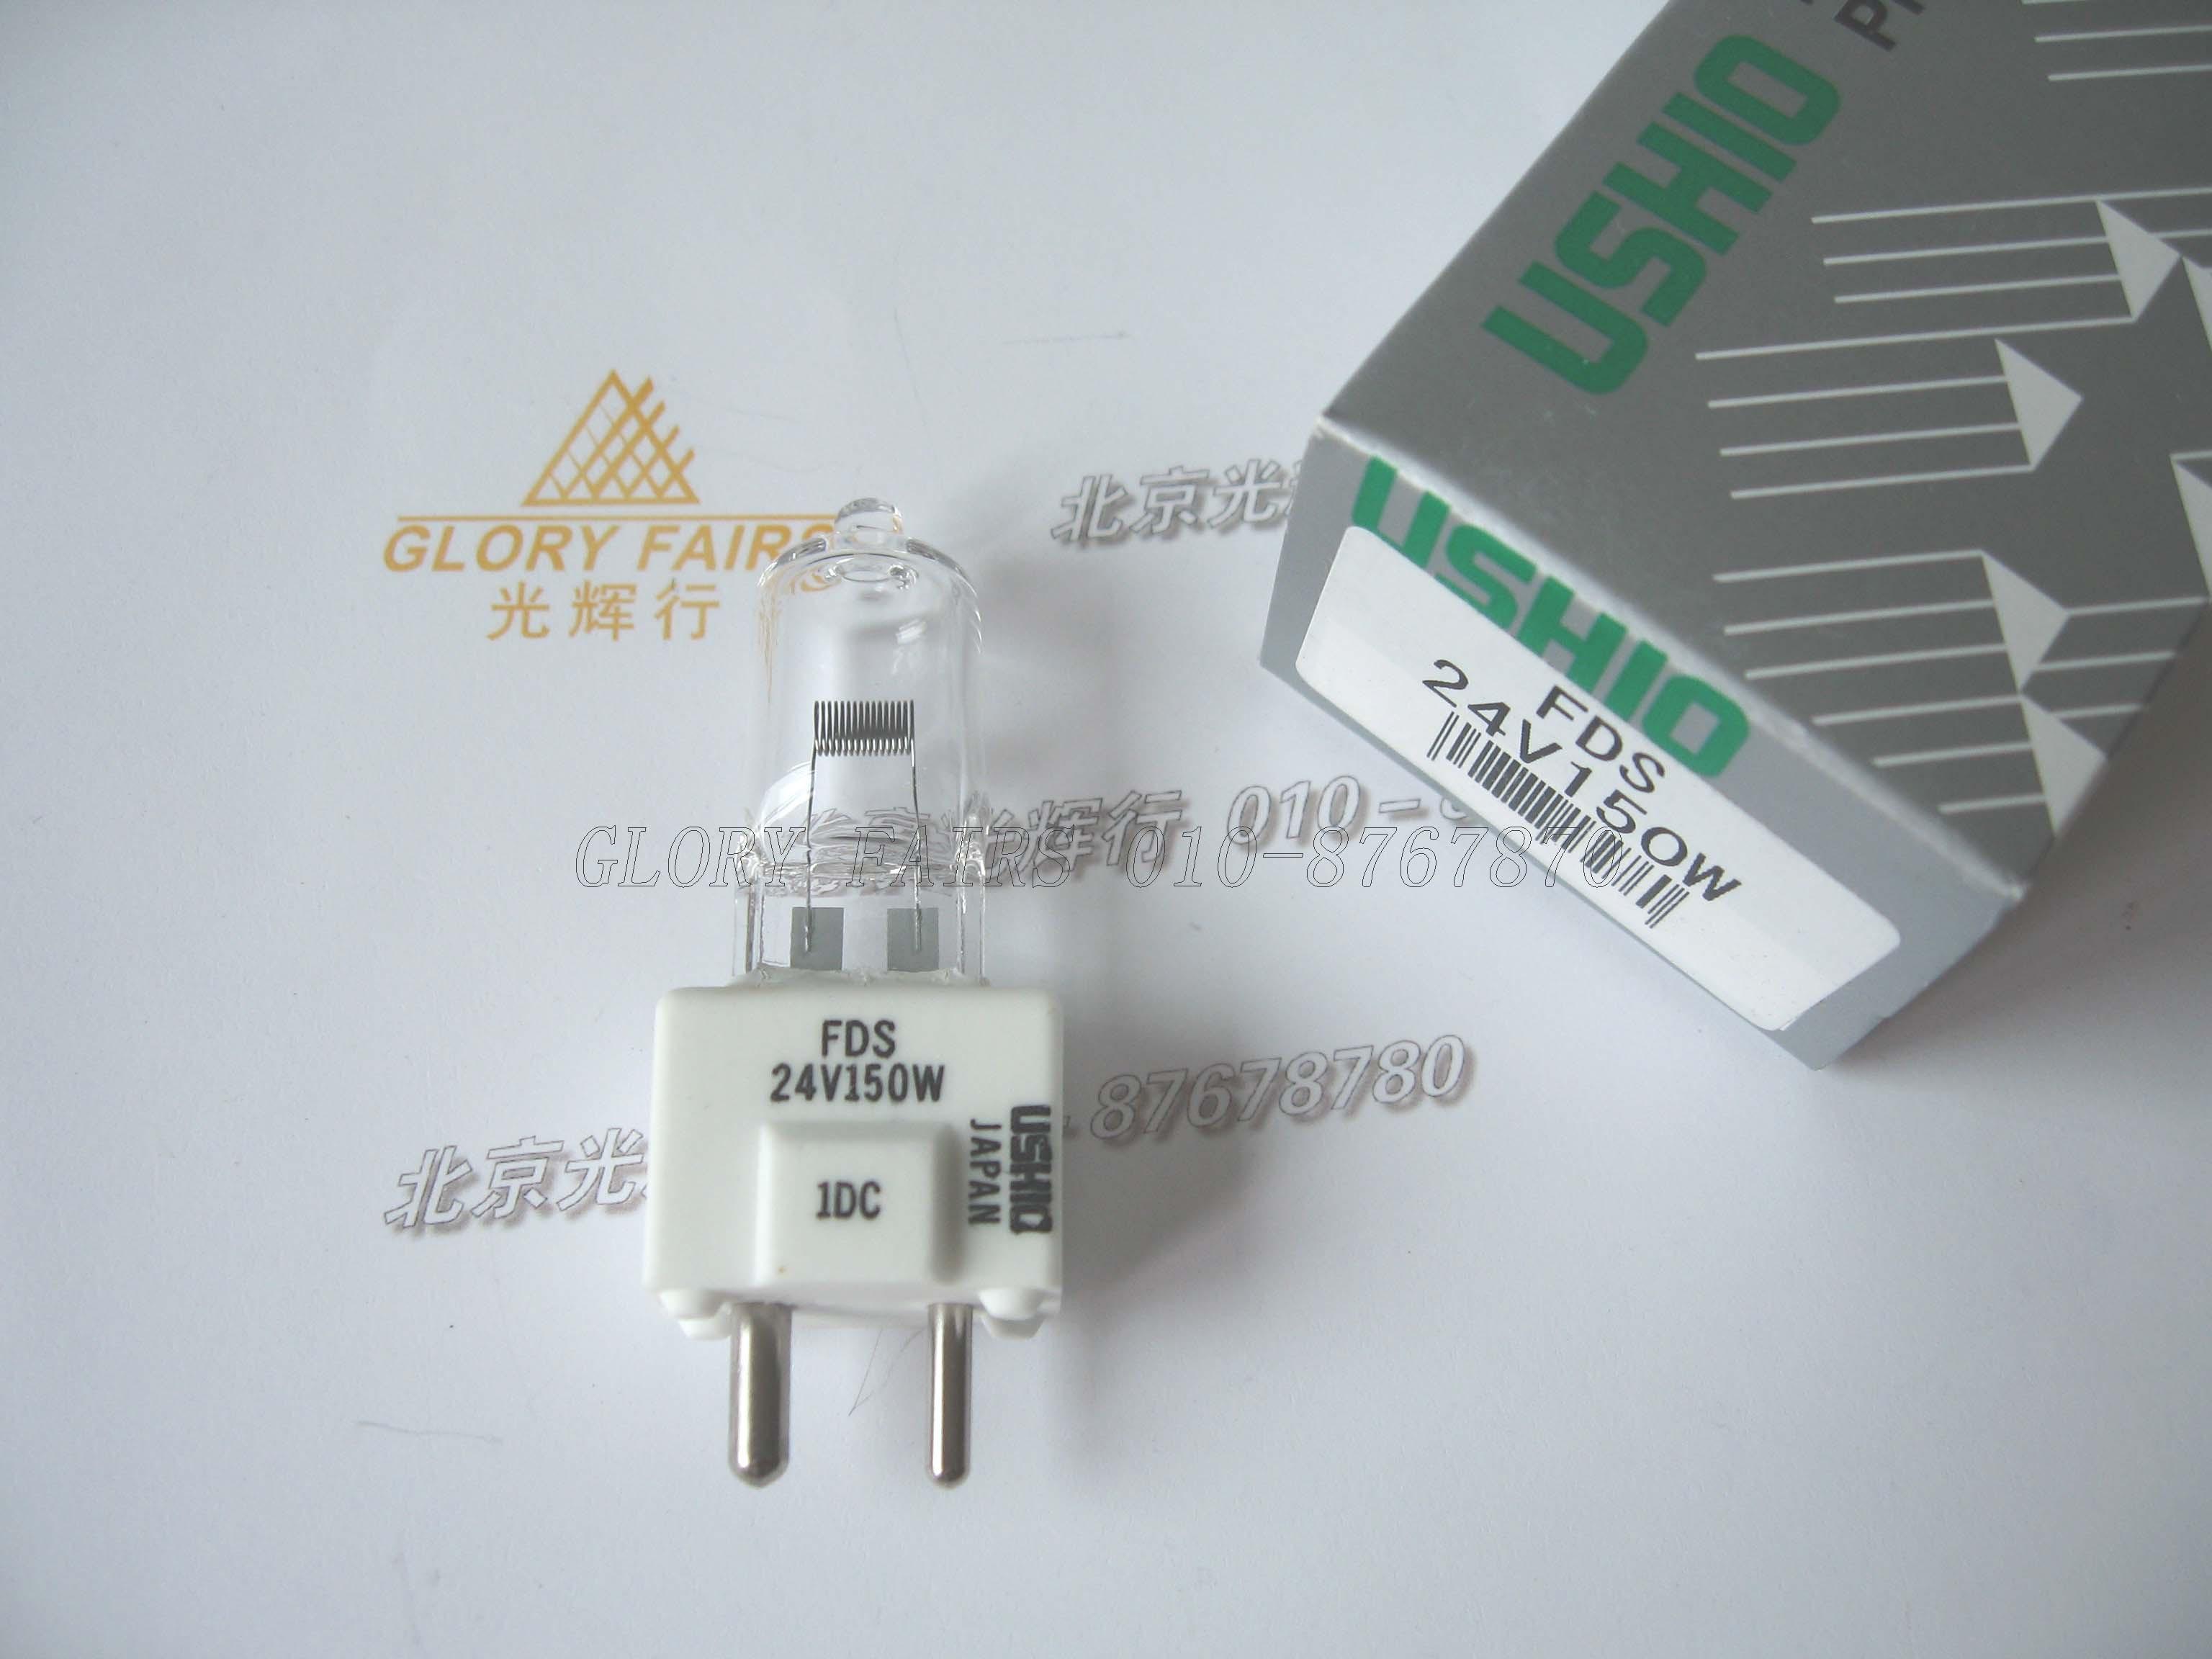 USHIO FDS 24V150W halogen lamp,24V 150W bulb,Apollo Efos Faro dental chair exam lights handpiece,Eureka automatic collimator(China (Mainland))